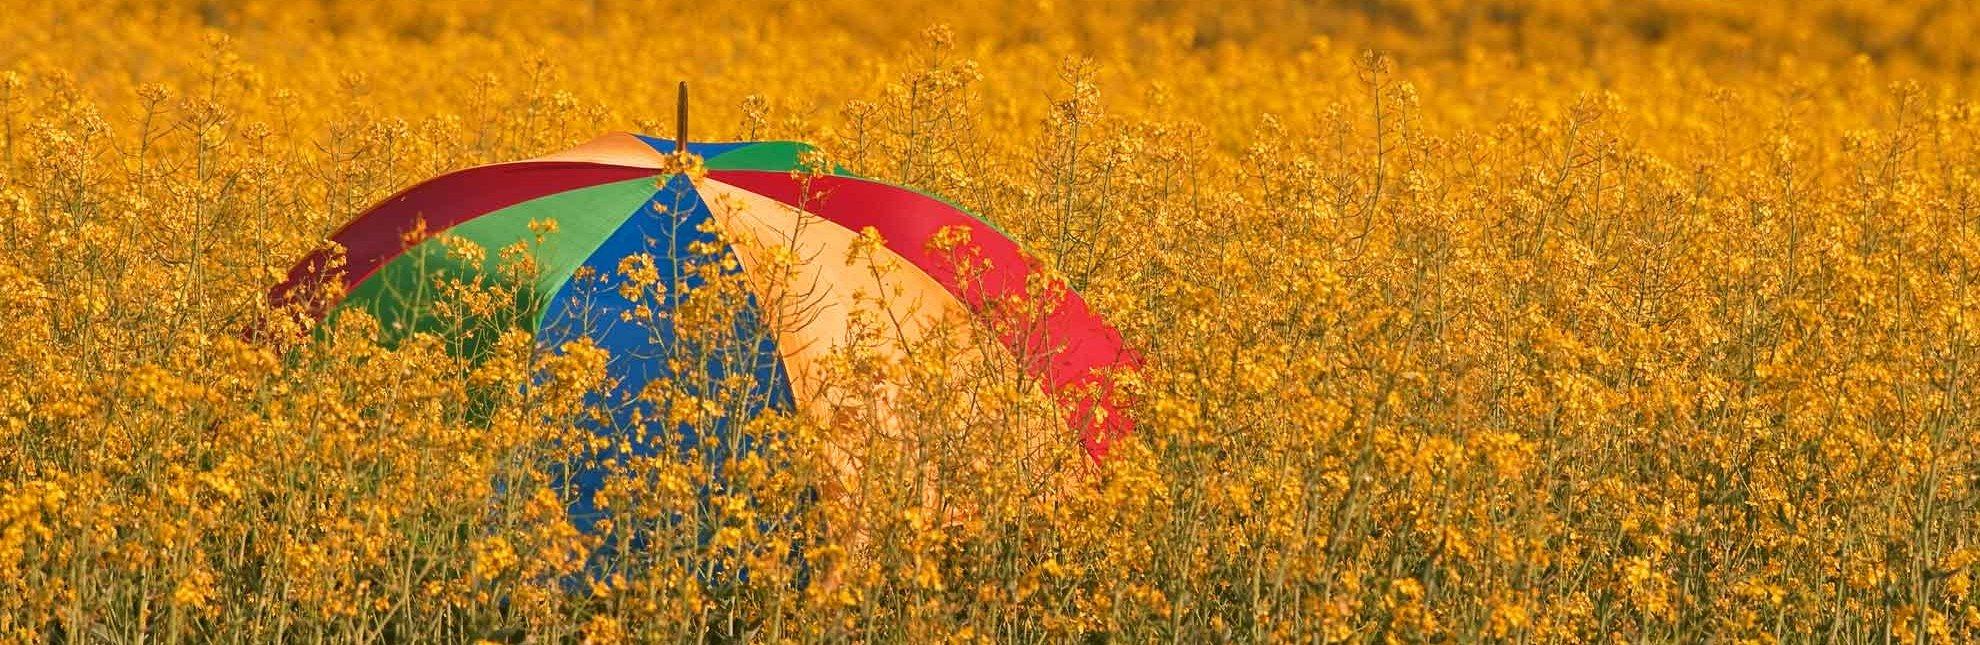 Rapsfeld mit Schirm, © Ebelt/HLMS